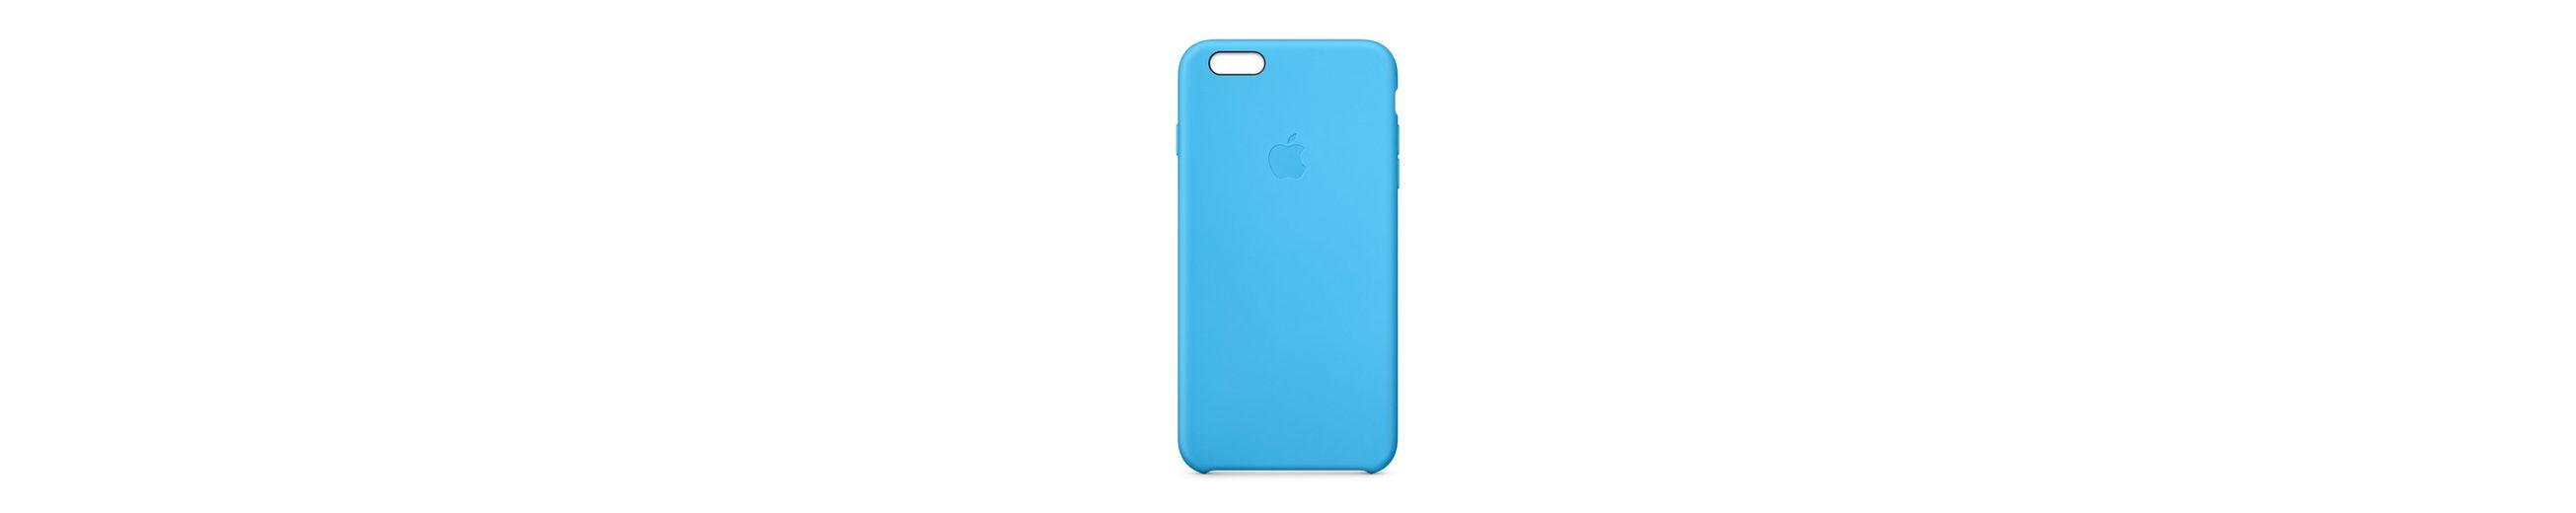 APPLE Silikon Case »iPhone 6 Plus Blue (MGRH2ZM/A)«